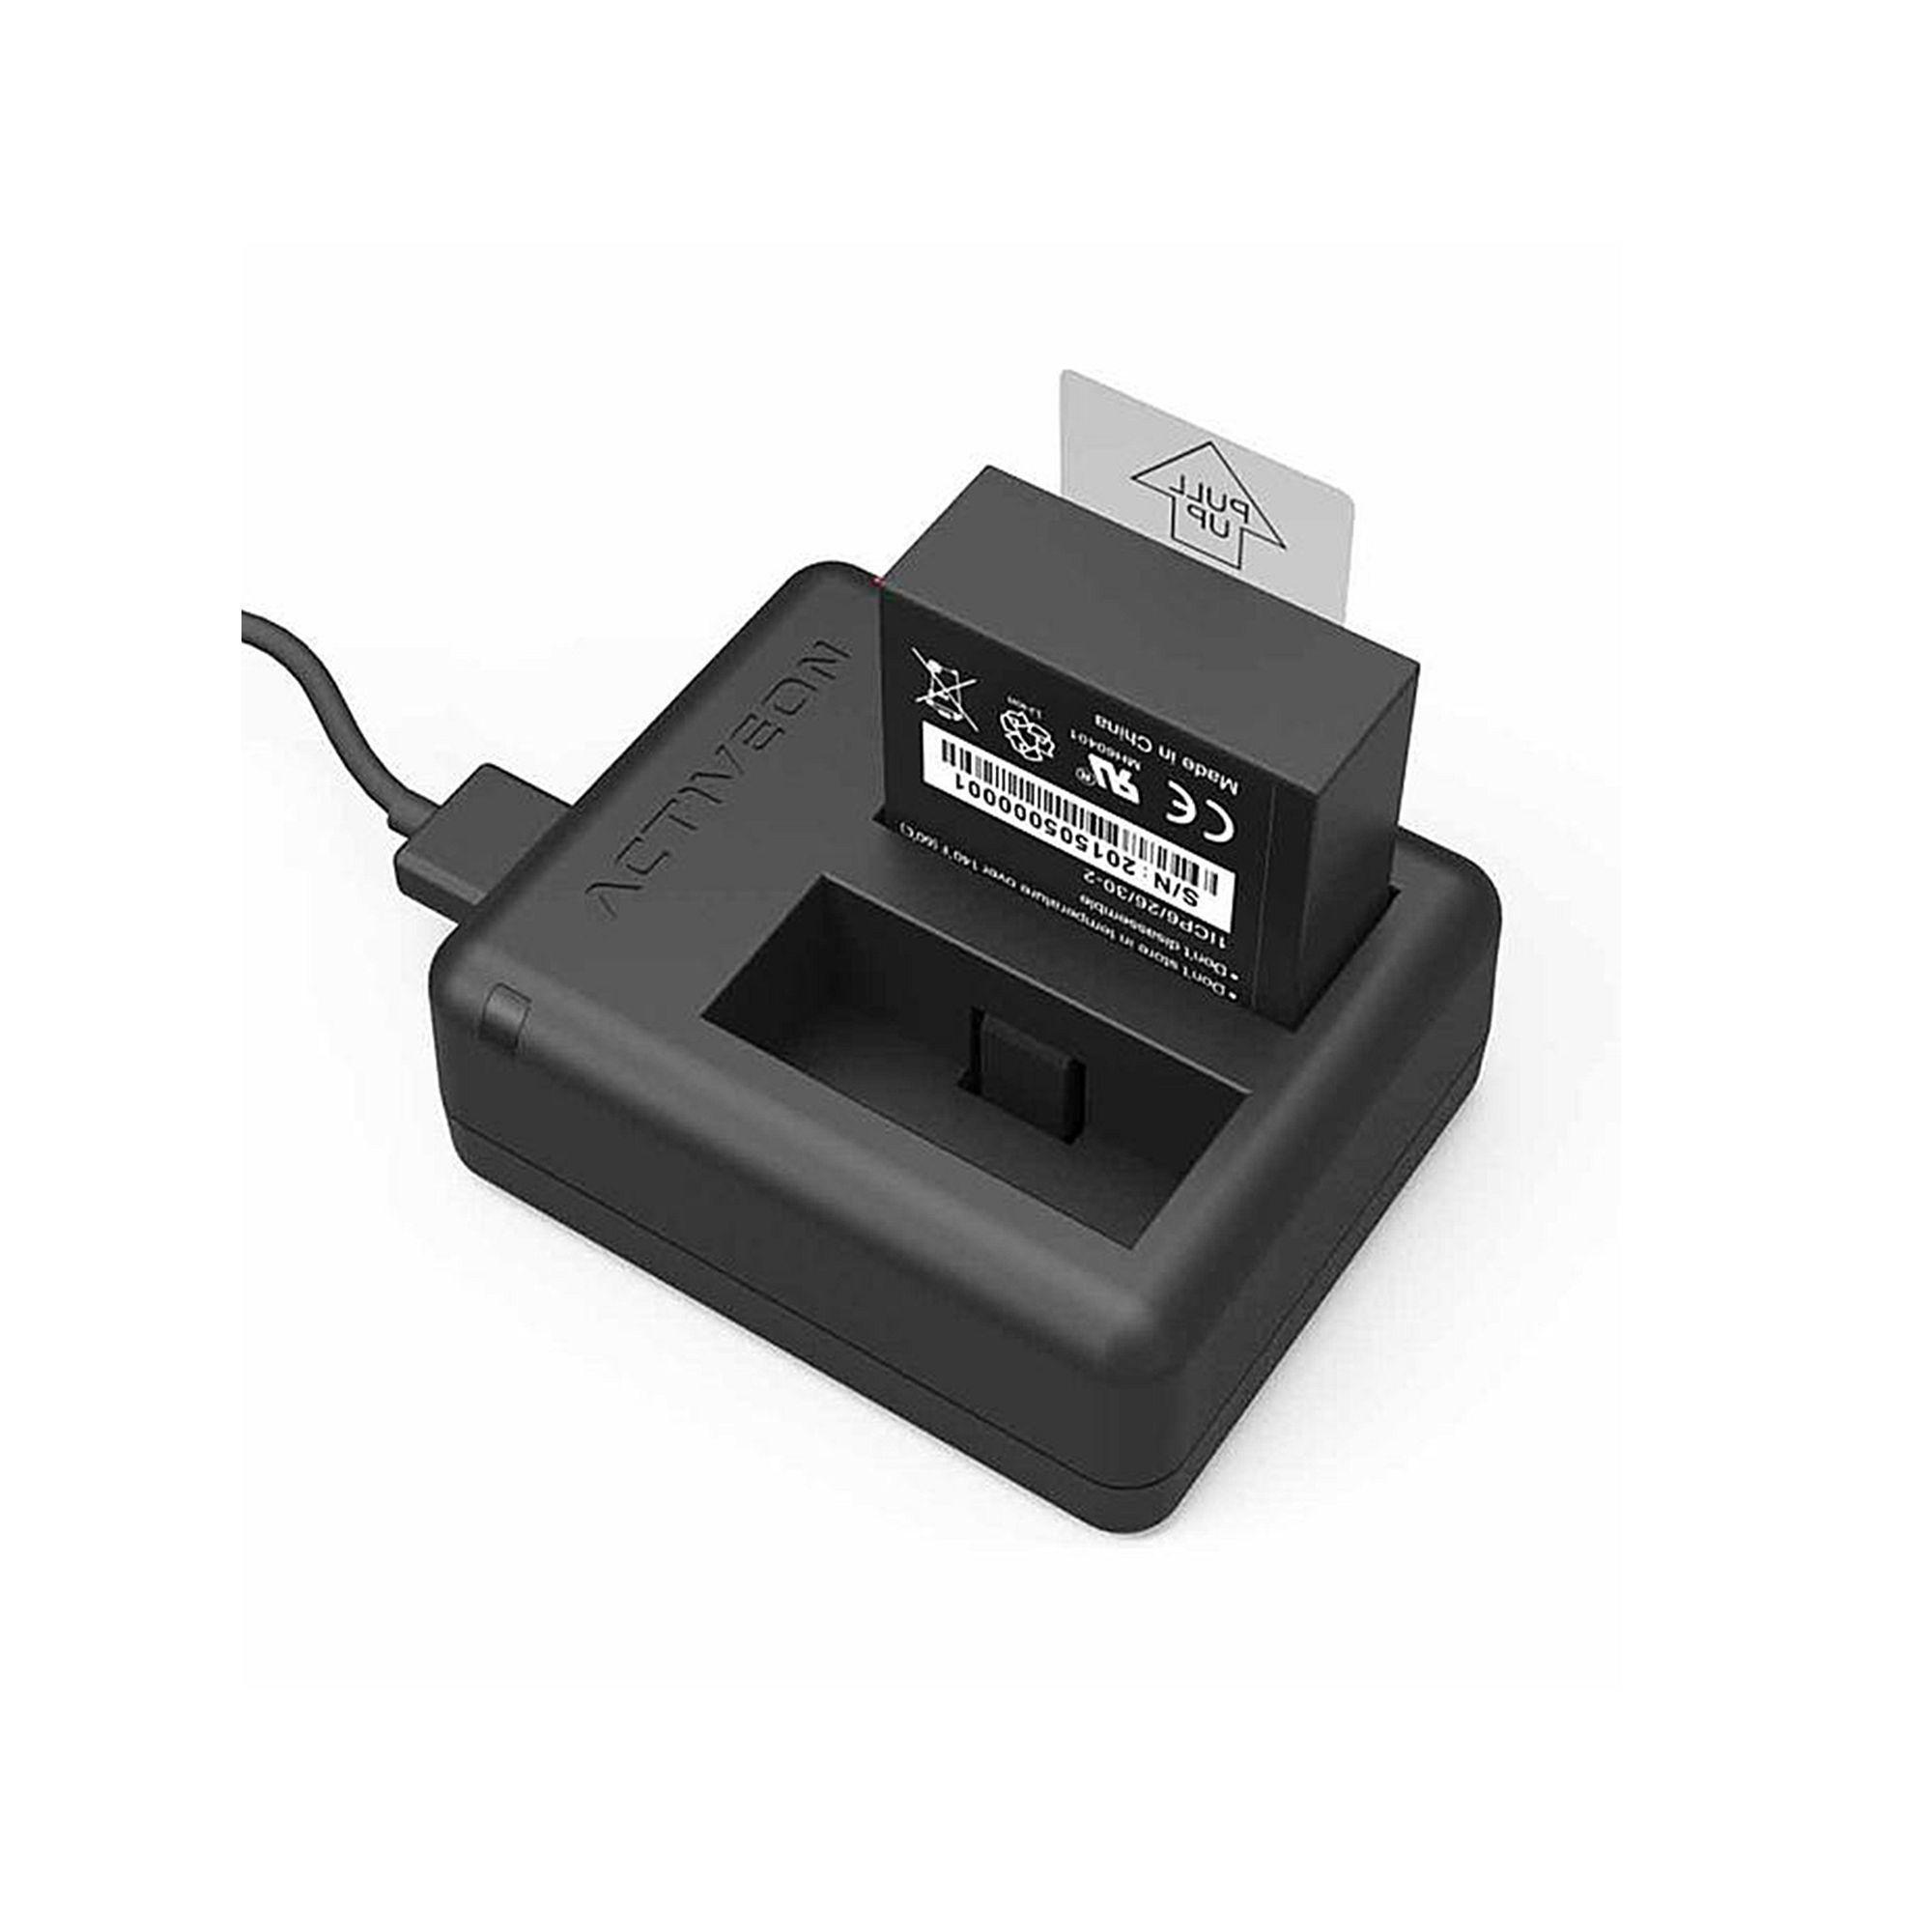 Activeon CX Camera Battery Charger, Black Camera battery